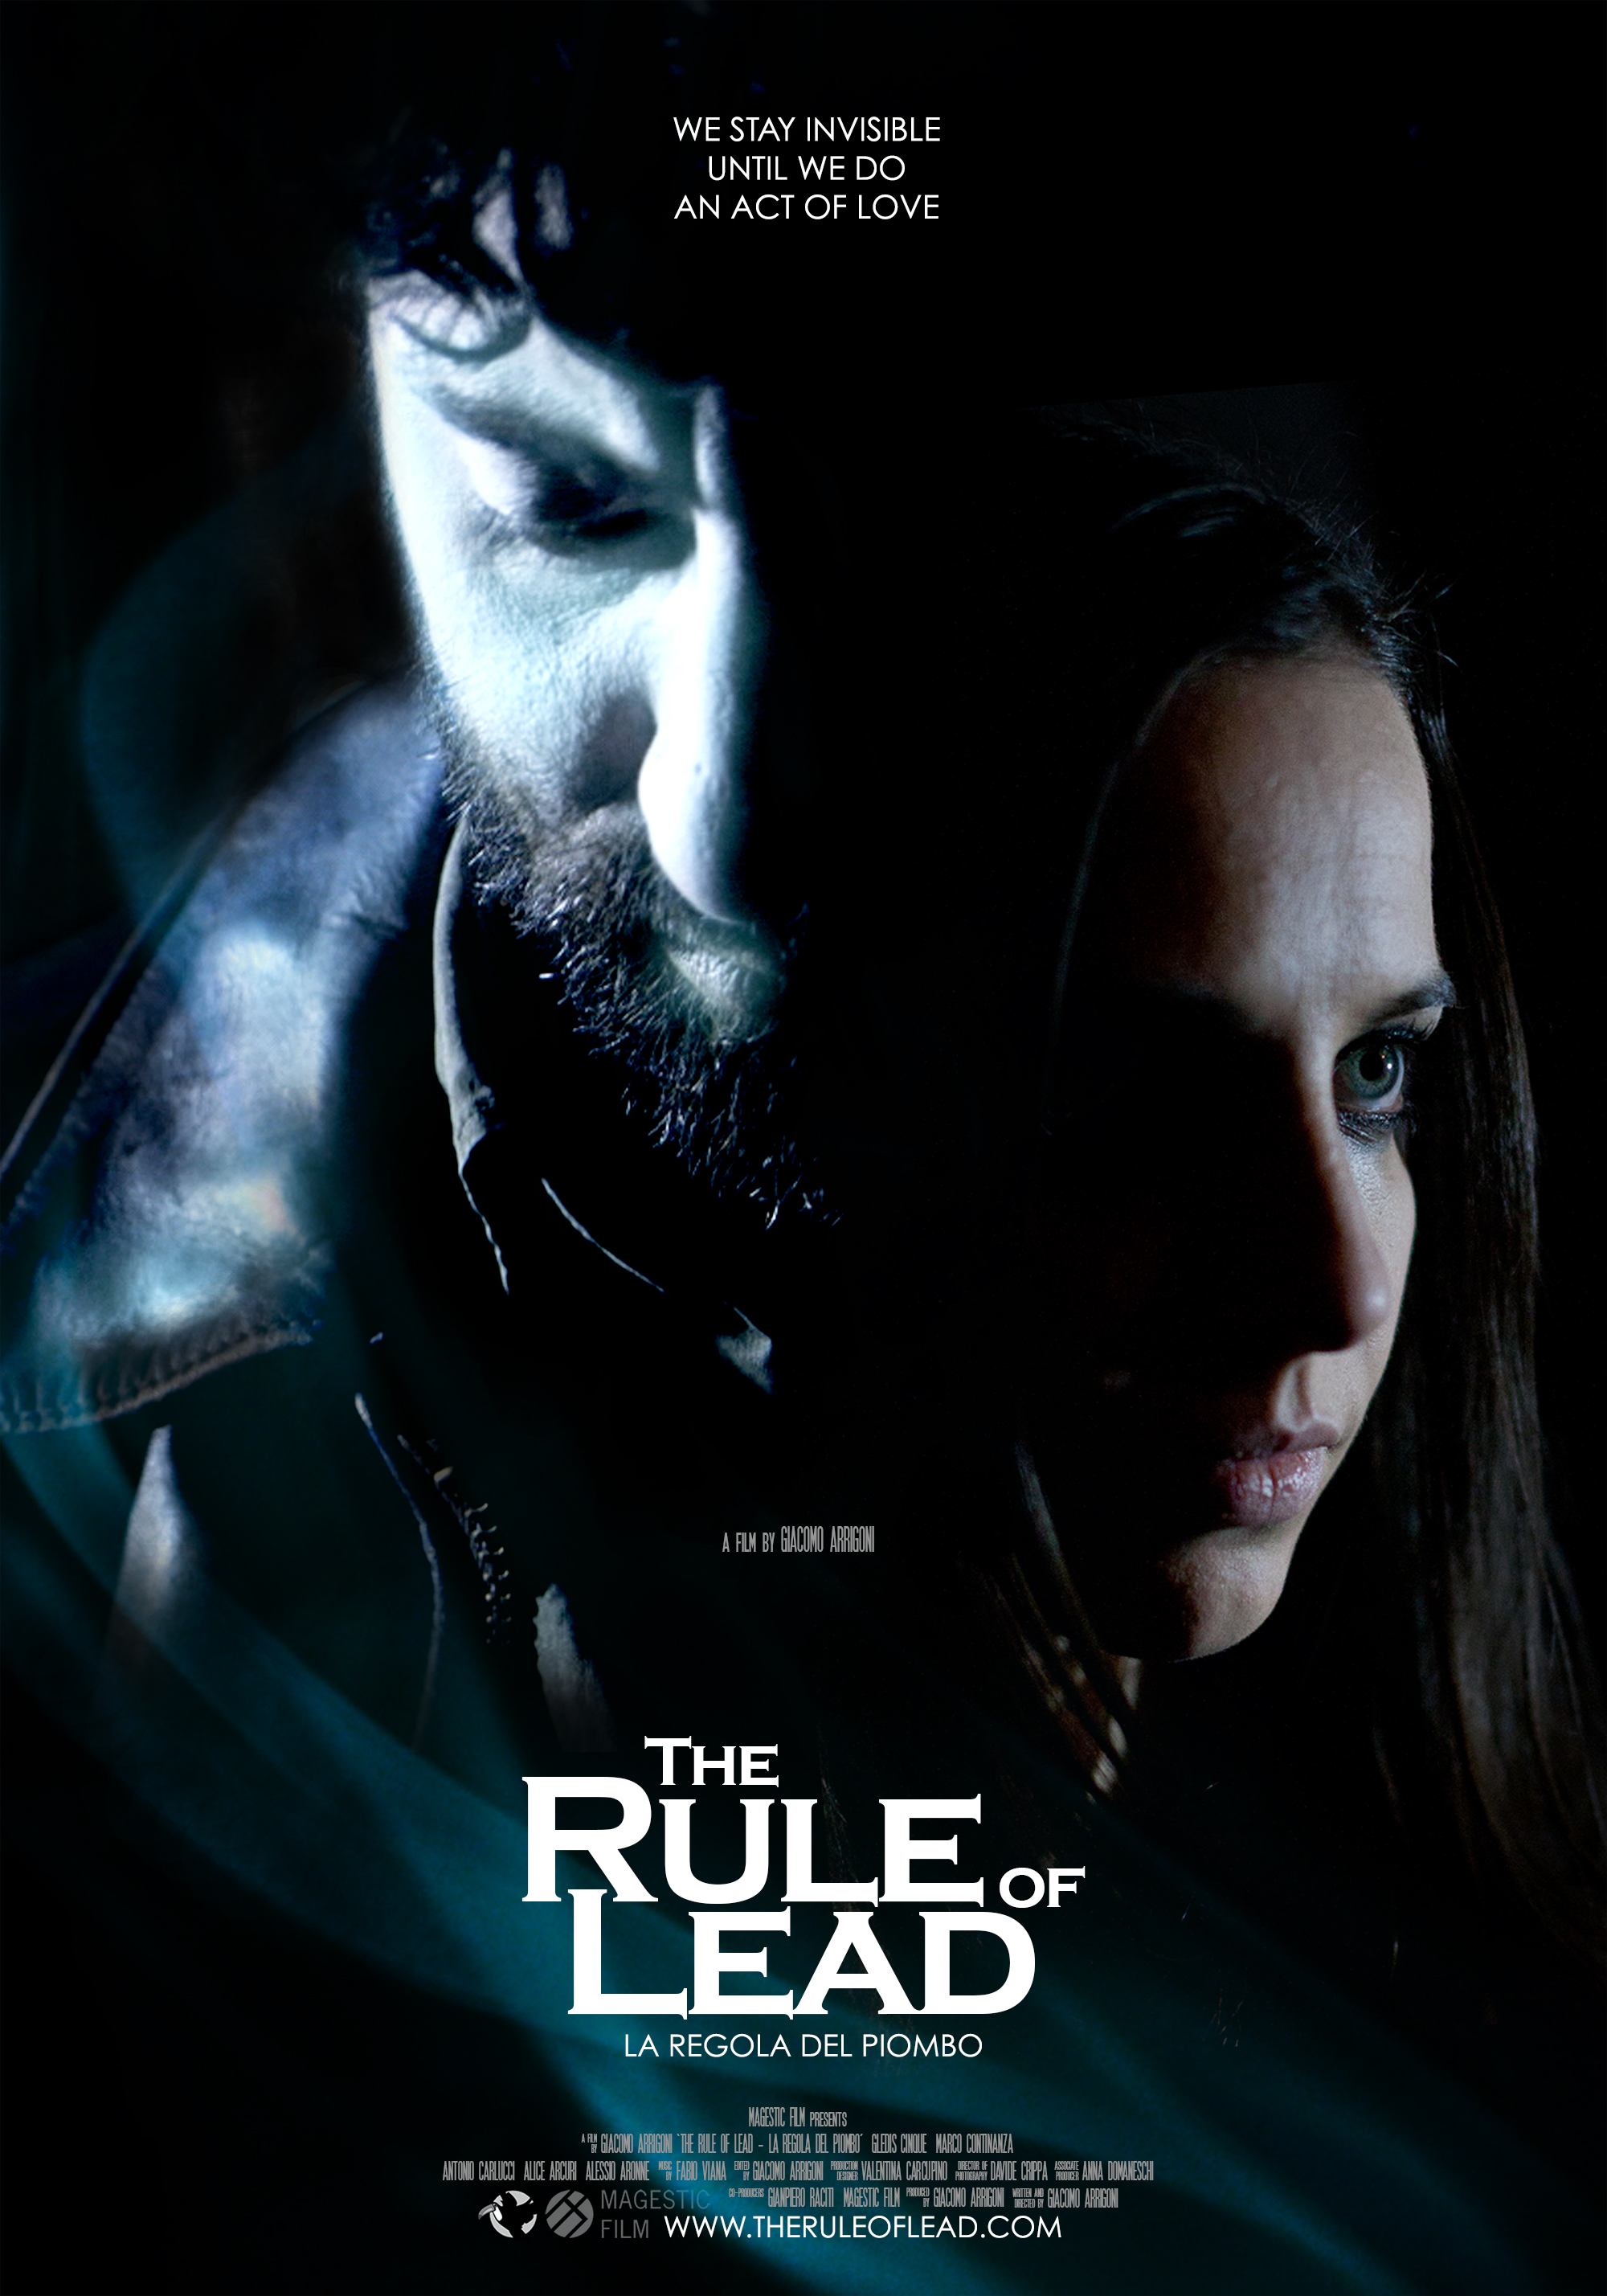 Poster The Rule of Lead LA REGOLA DEL PIOMBO   Lintervista a Giacomo Arrigoni